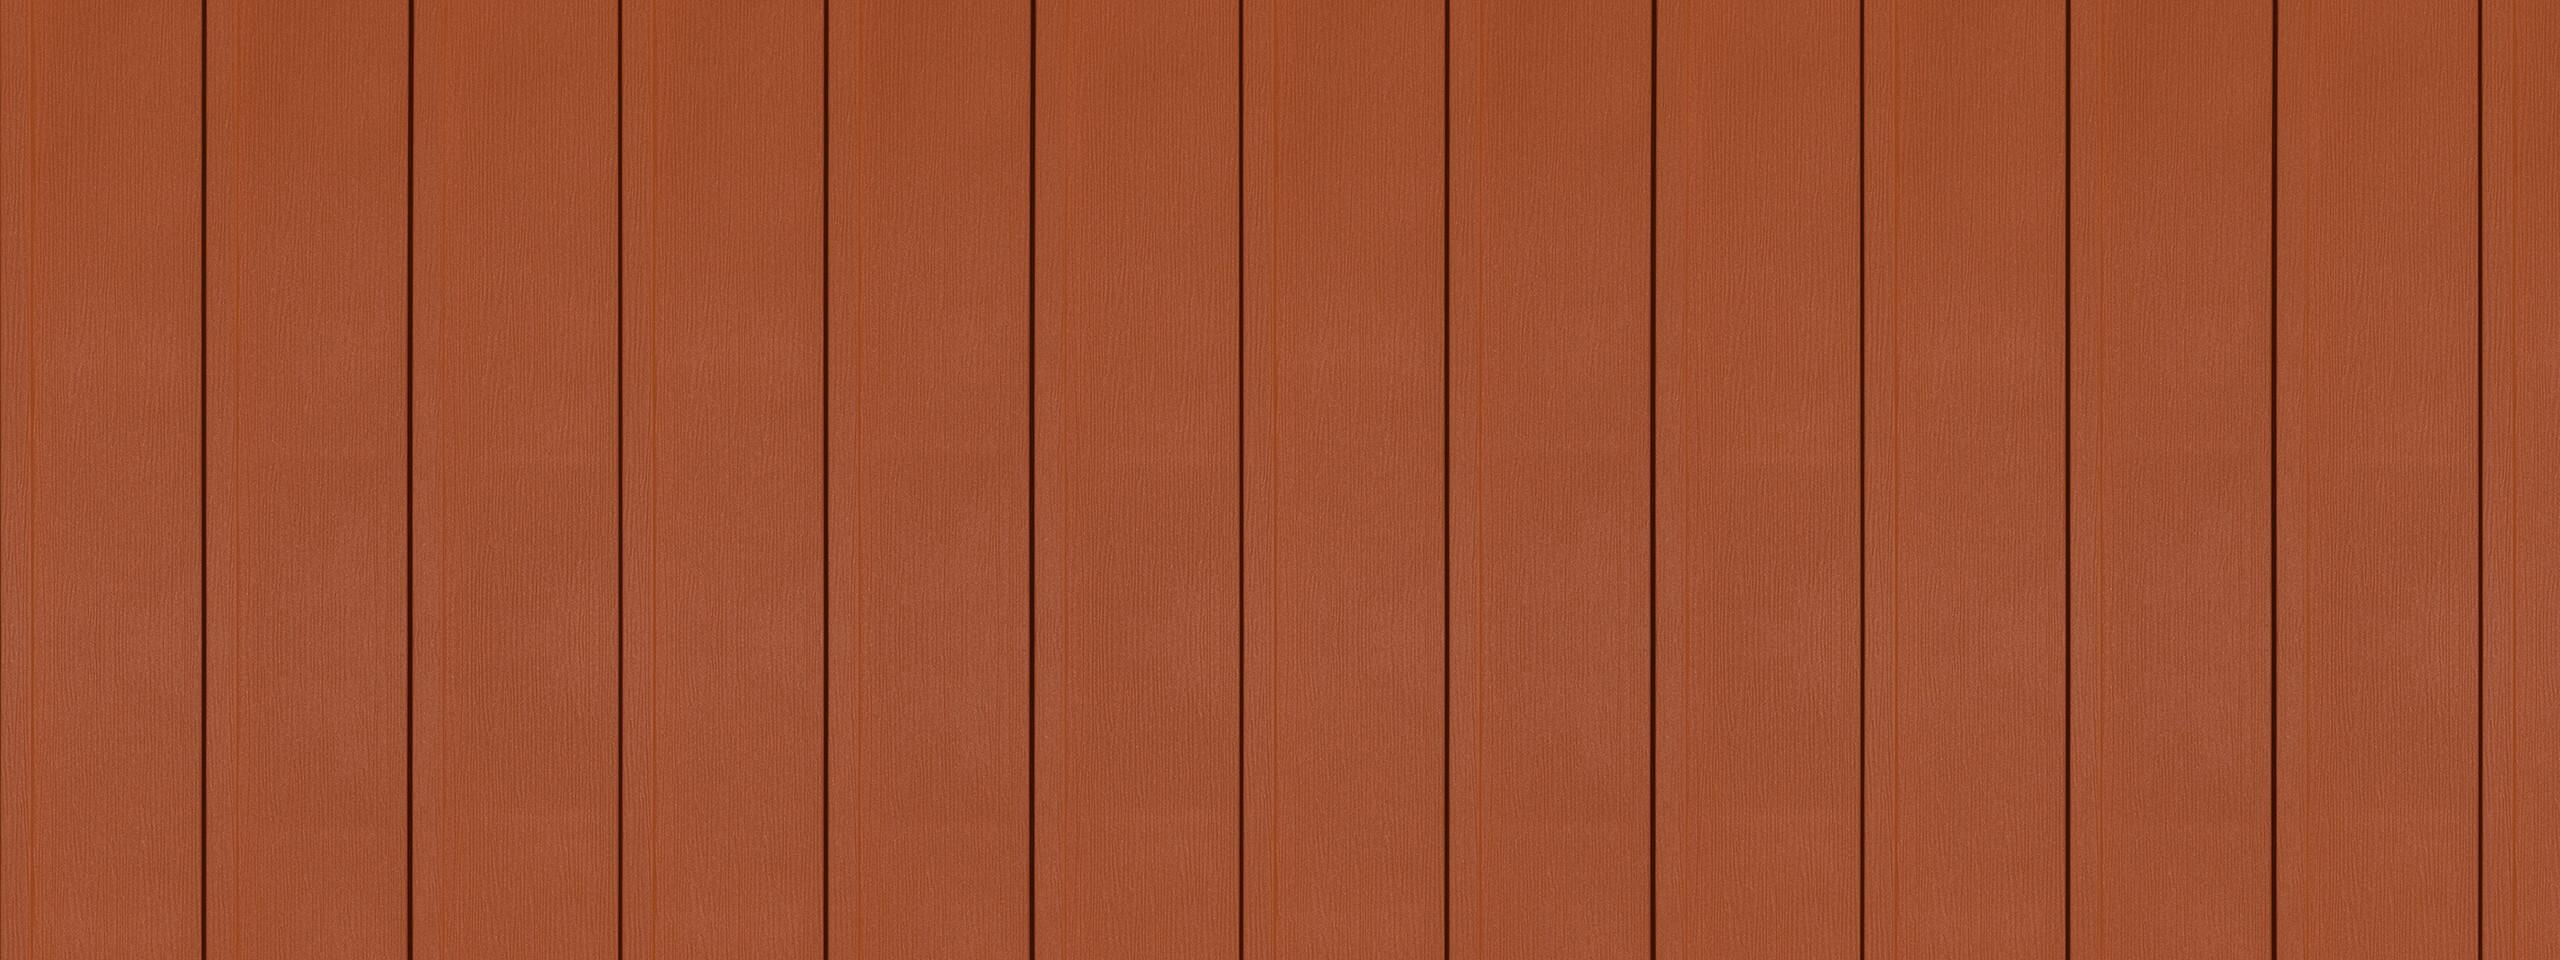 Entex Sedona red steel siding